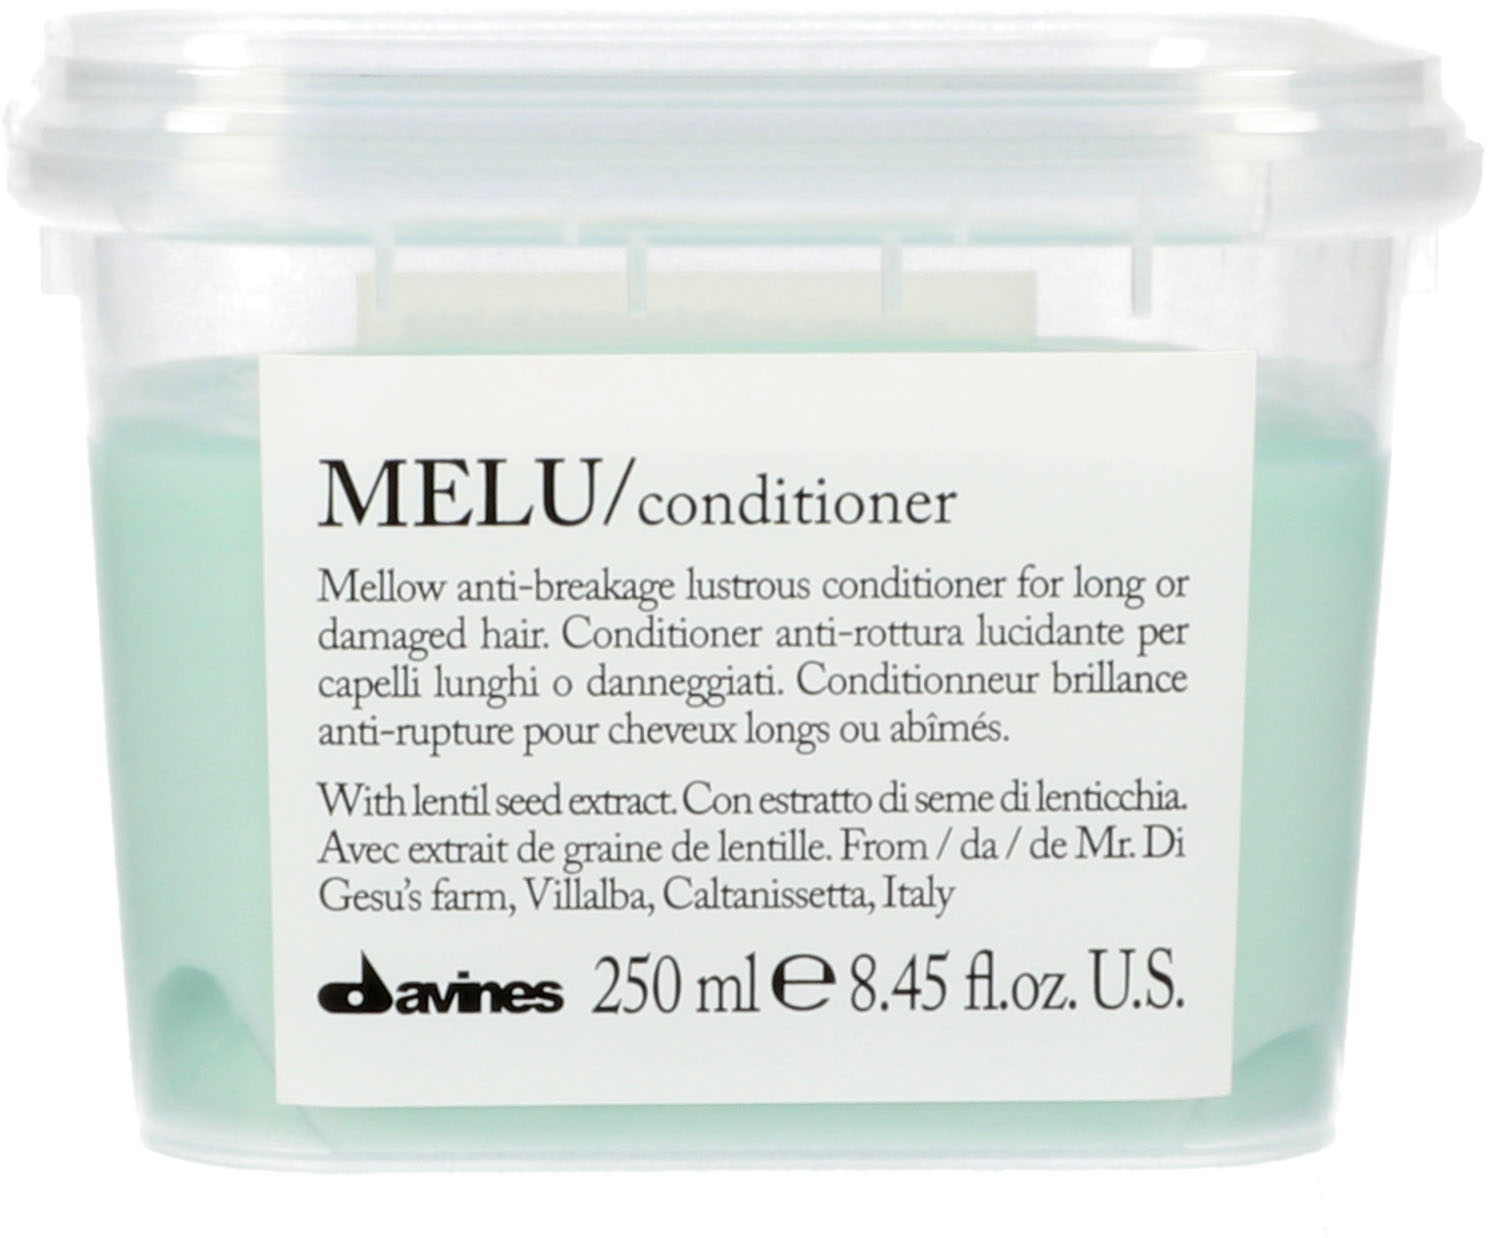 Davines MELU Conditioner 250 ml DV-323620